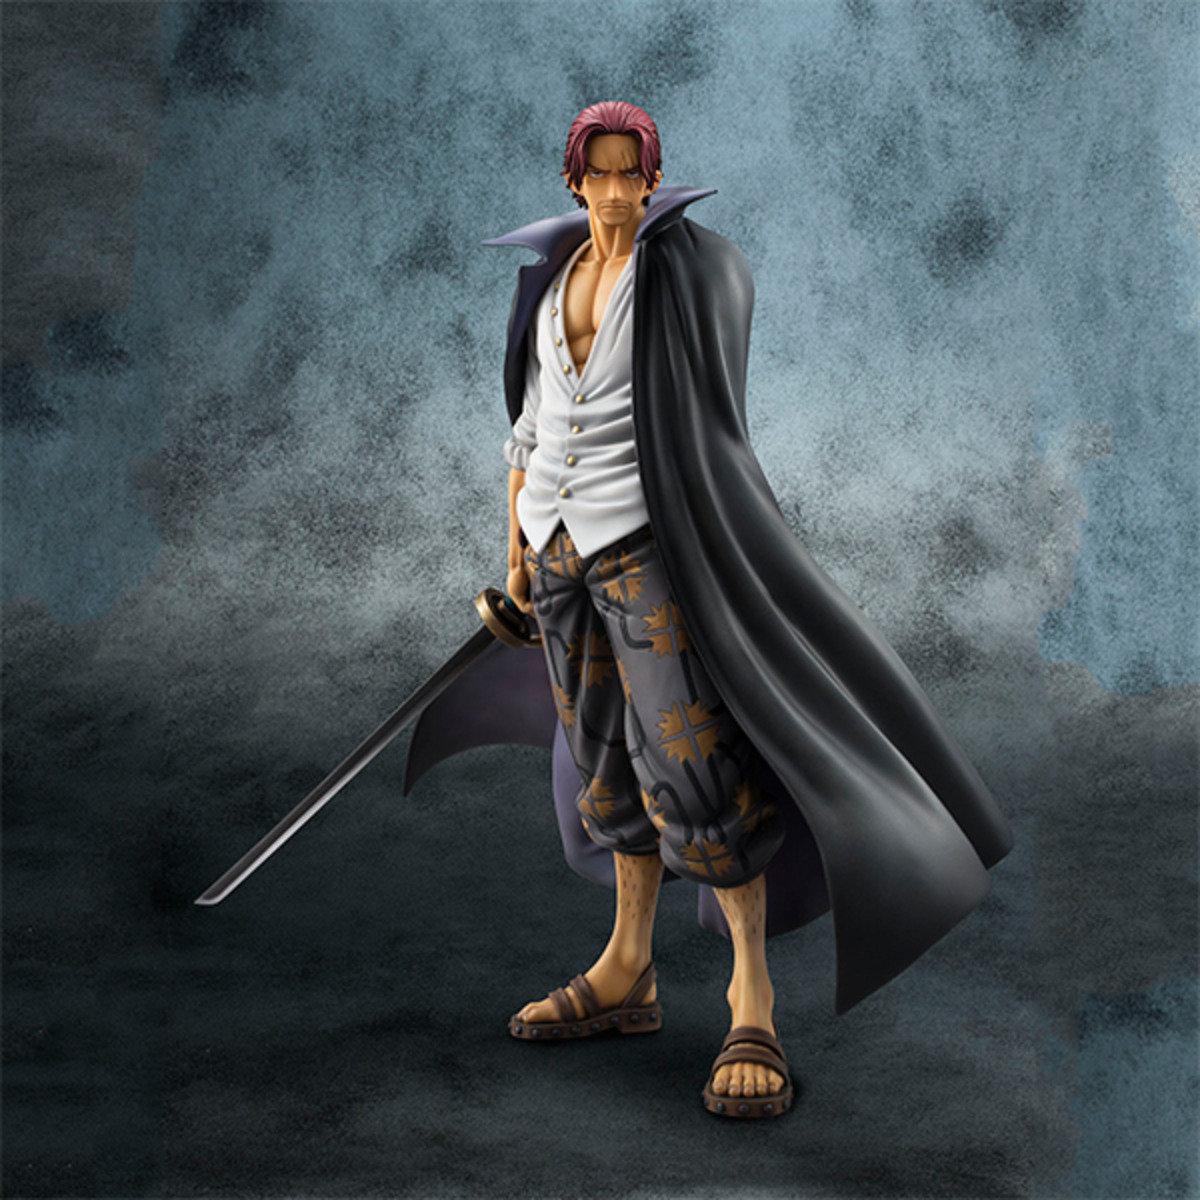 海賊王 1/8 Excellent Model Portrait Of Pirates 系列 NEO-DX  四皇 – 紅髮香克斯